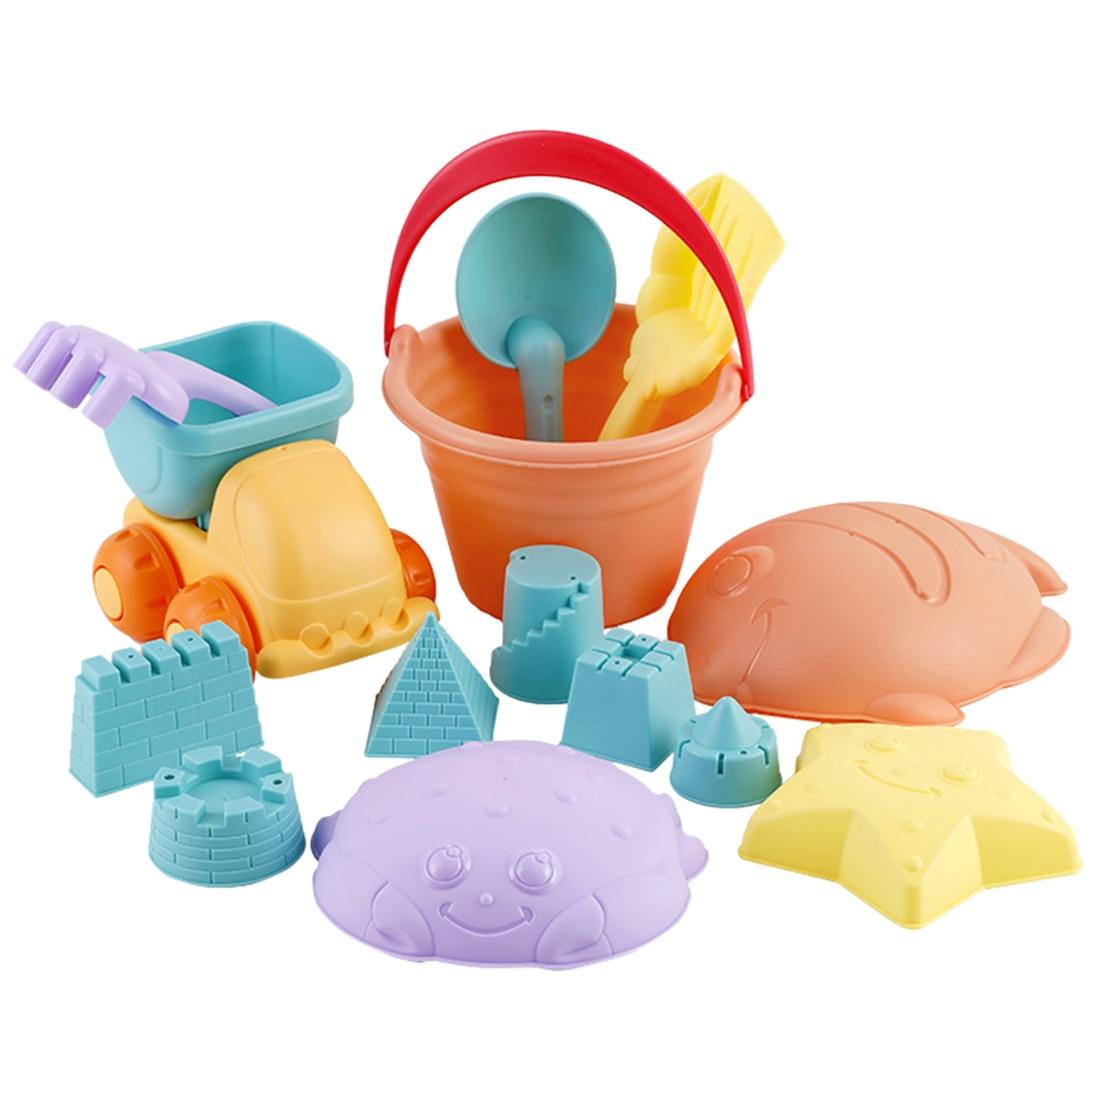 14Pcs Soft Rubber Outdoor Beach Sand Toy Set Baby Beach Bucket Playset For Kids Beach Sand Toys Set - Random Color